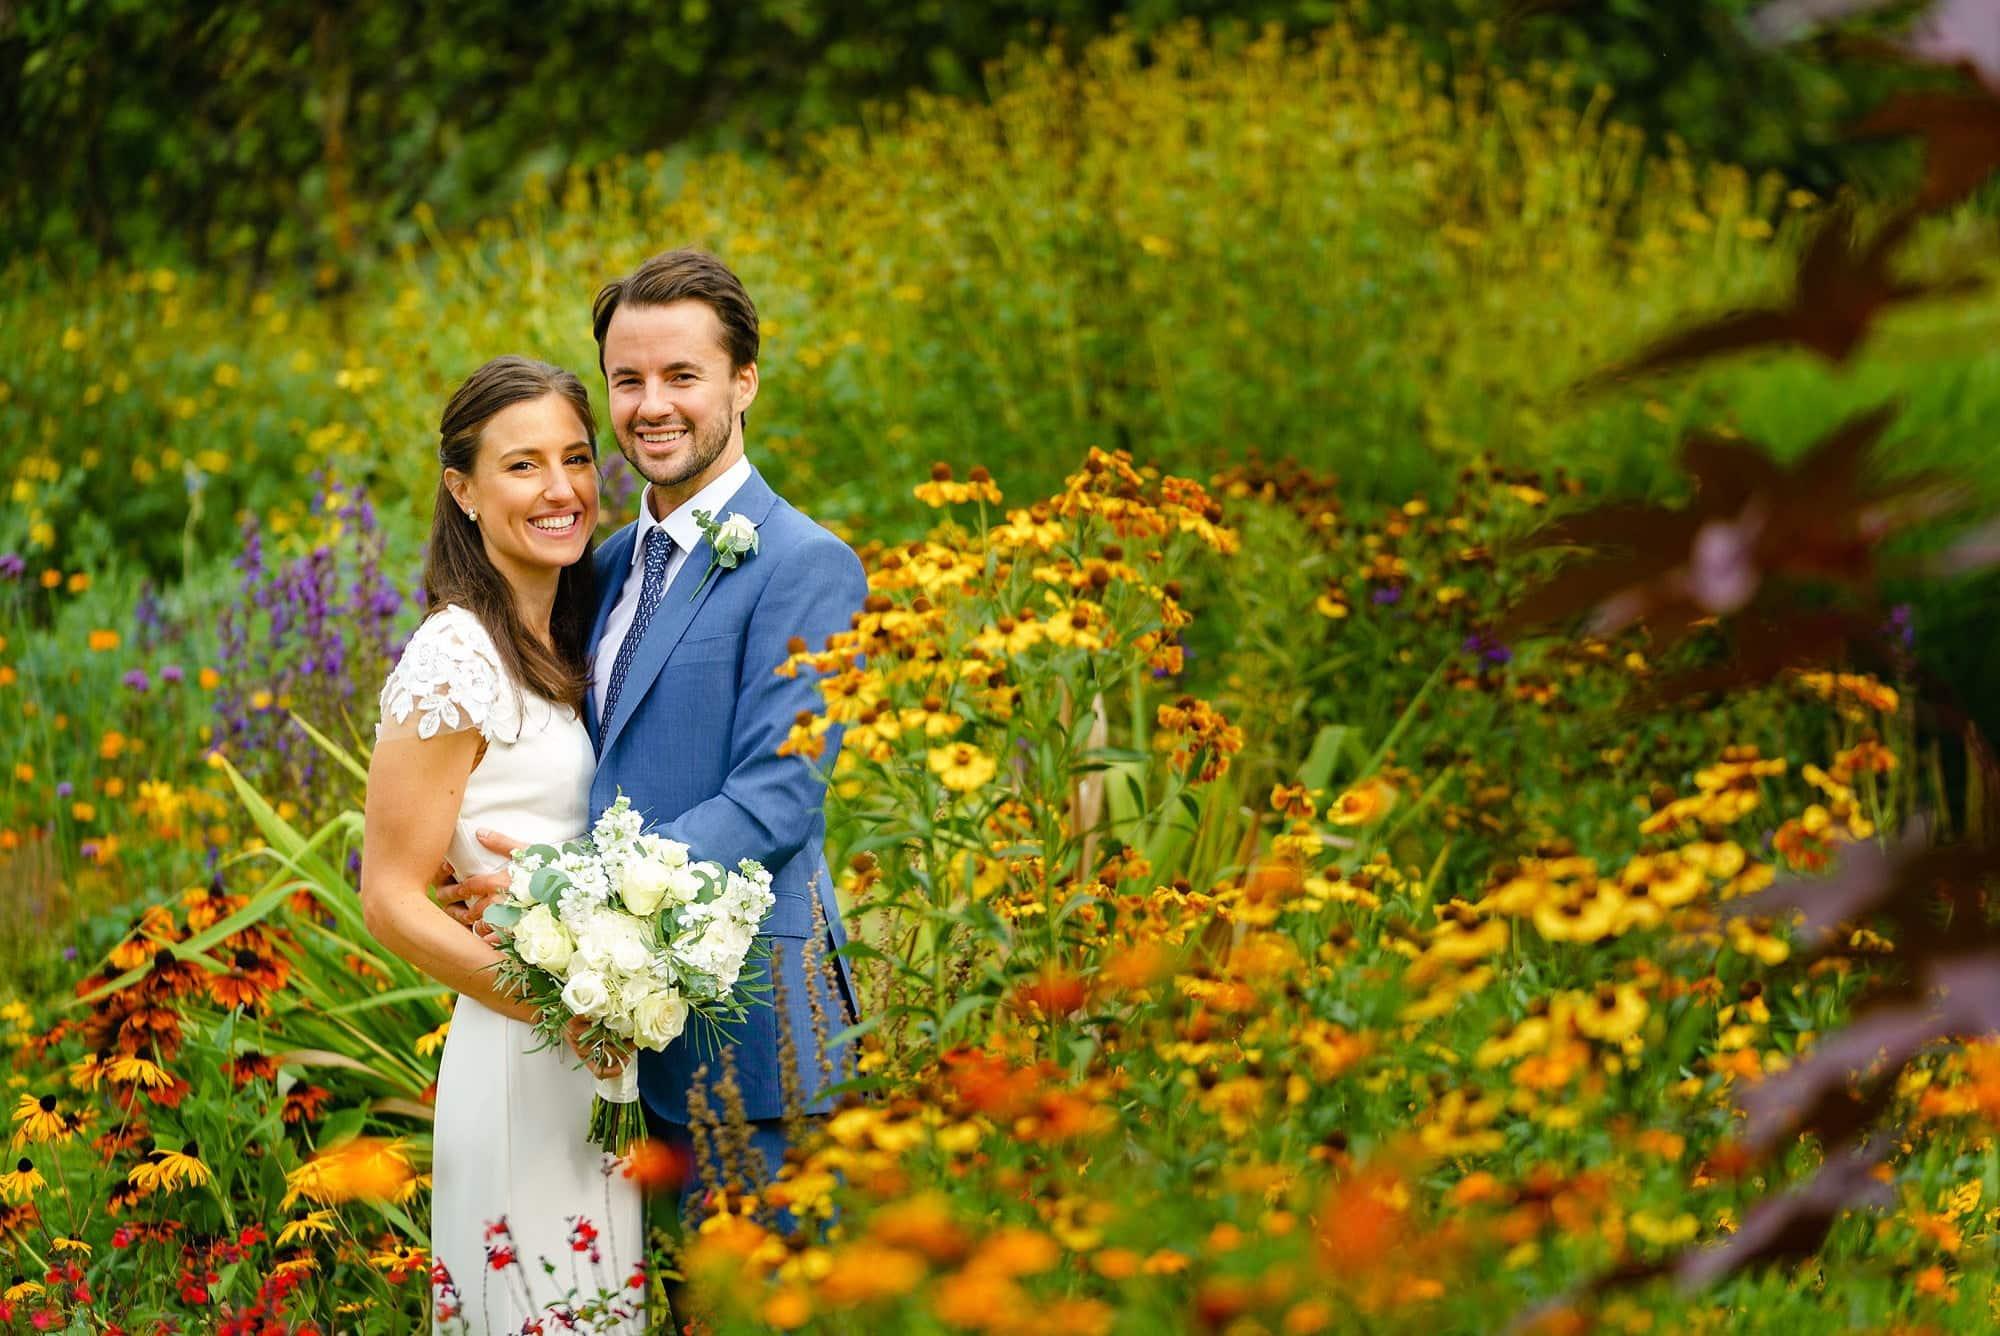 Loseley wedding photographer | Quinn & Tom